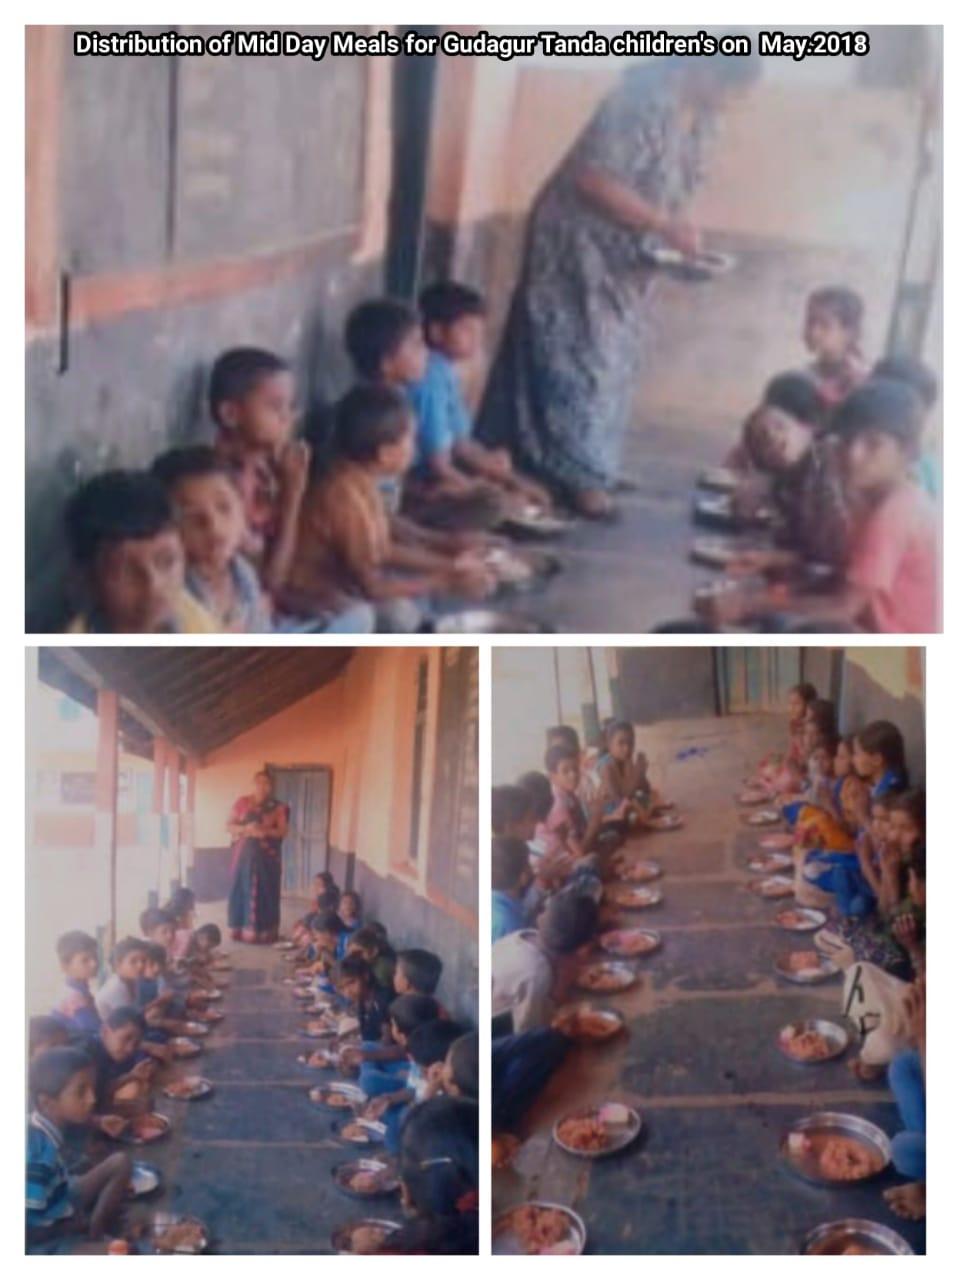 /media/saraswati/1NGO-00257-Shri_Saraswati_Mahila_Mandal-Board_Members-Main_Page-Food_Distribution_for_Gudugar_Tanda_childrens.jpg.jpeg